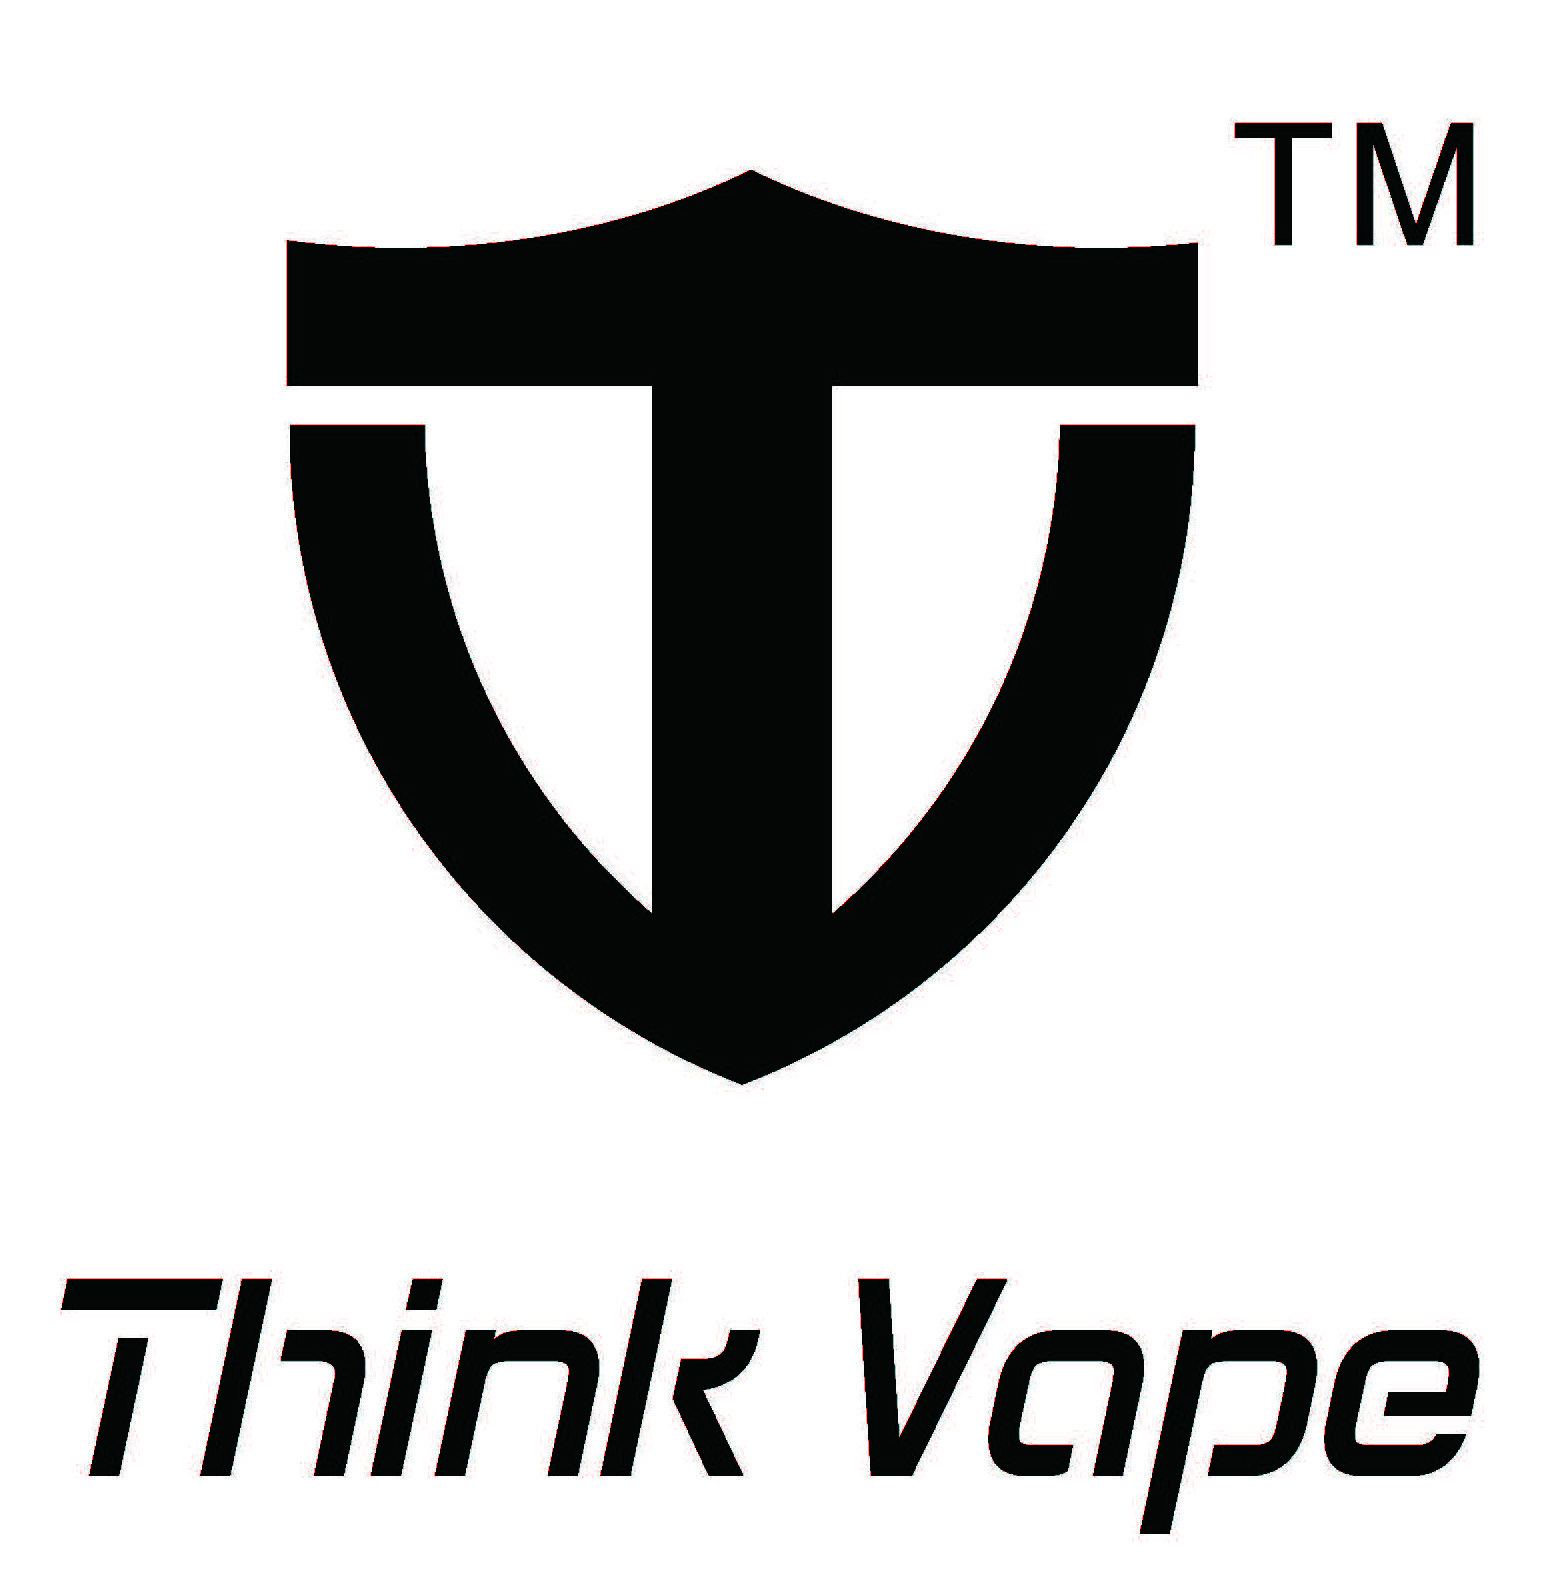 Logo of Thinkvape (มีรูปภาพ)